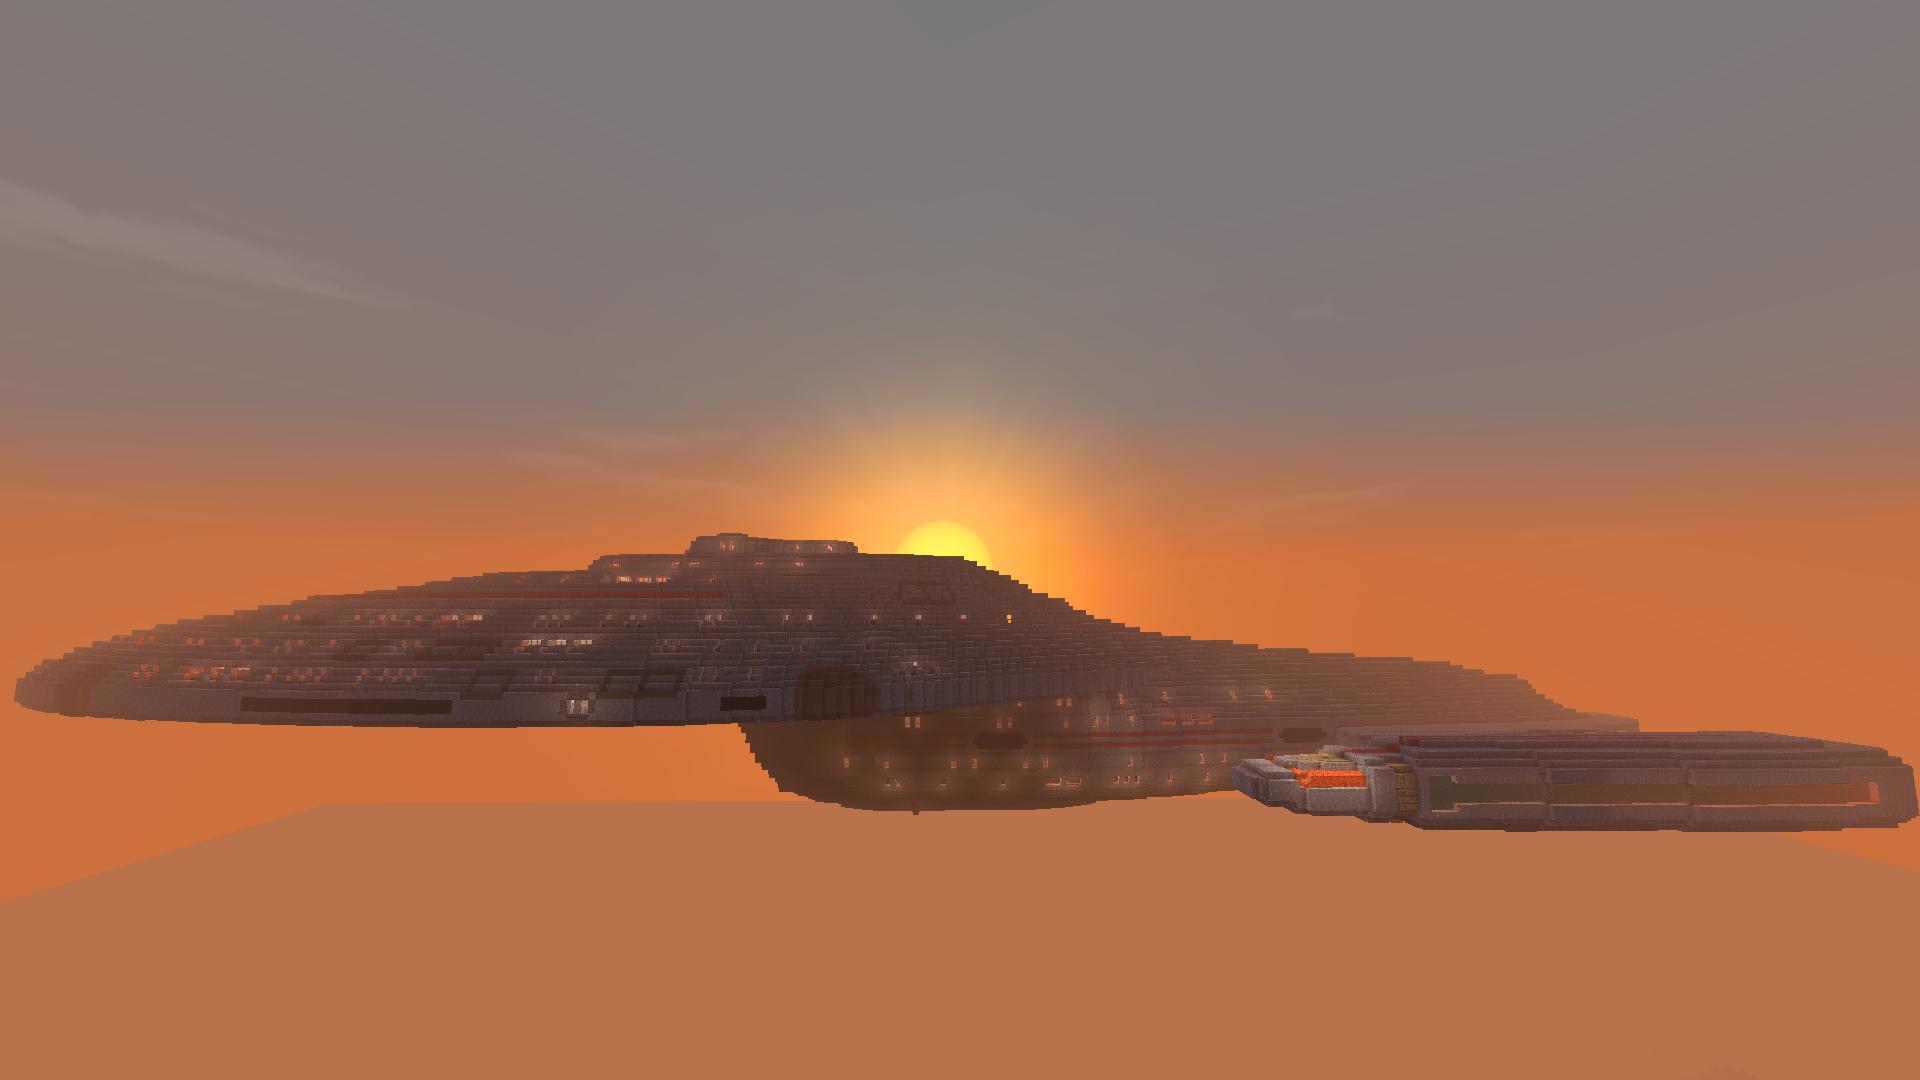 construction-minecraft-star-trek-voyager